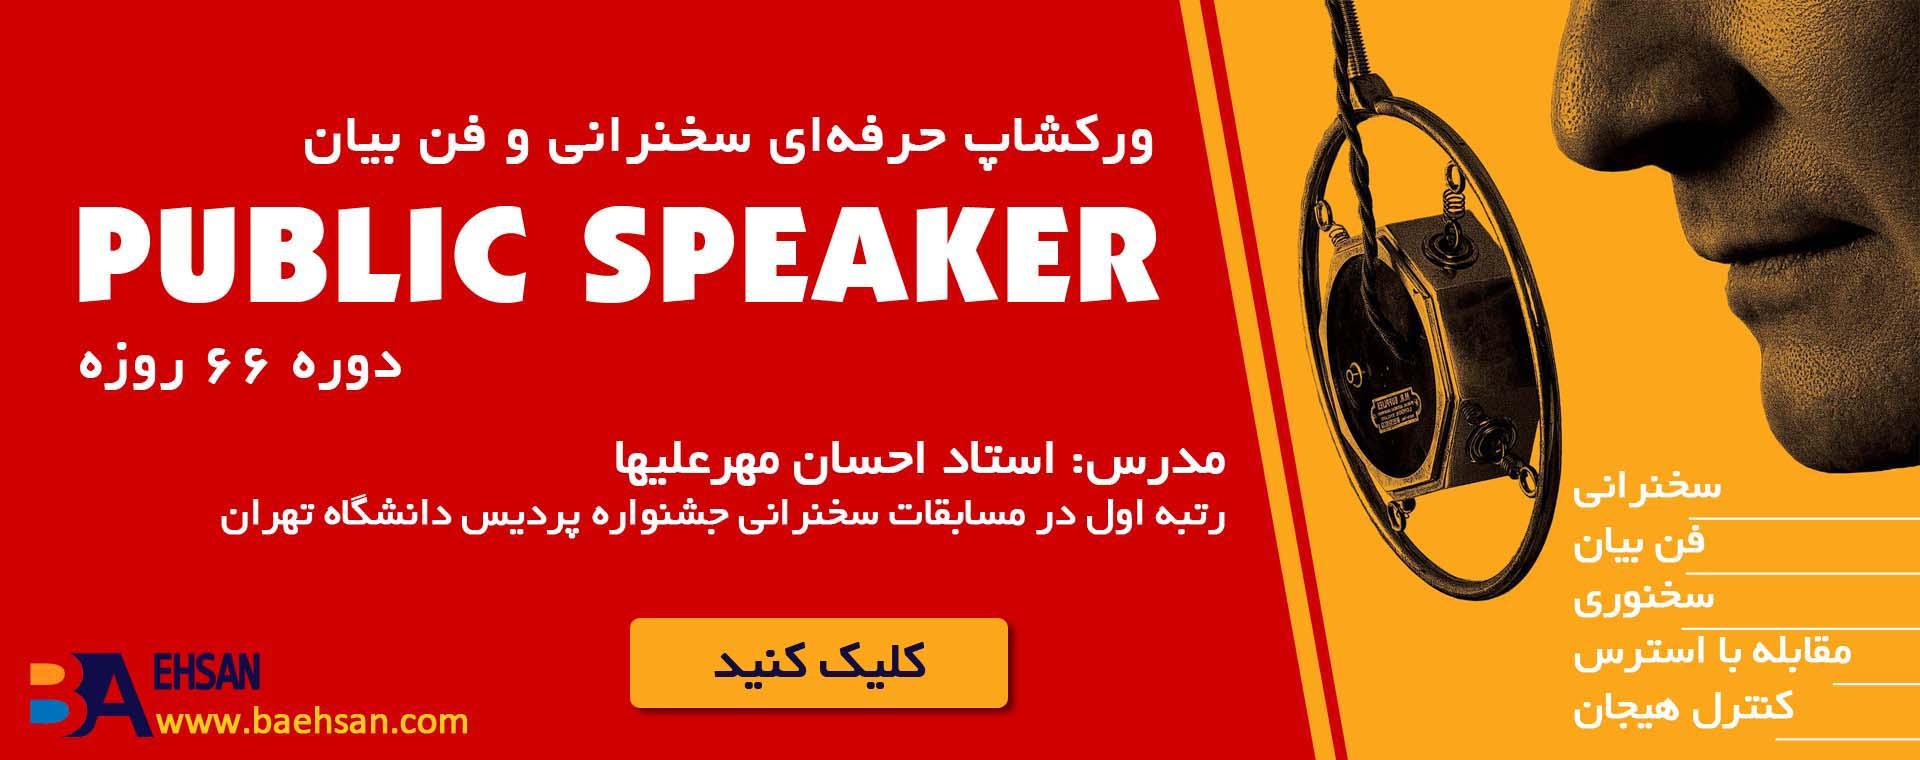 ورکشاپ سخنرانی و فن بیان public speaker